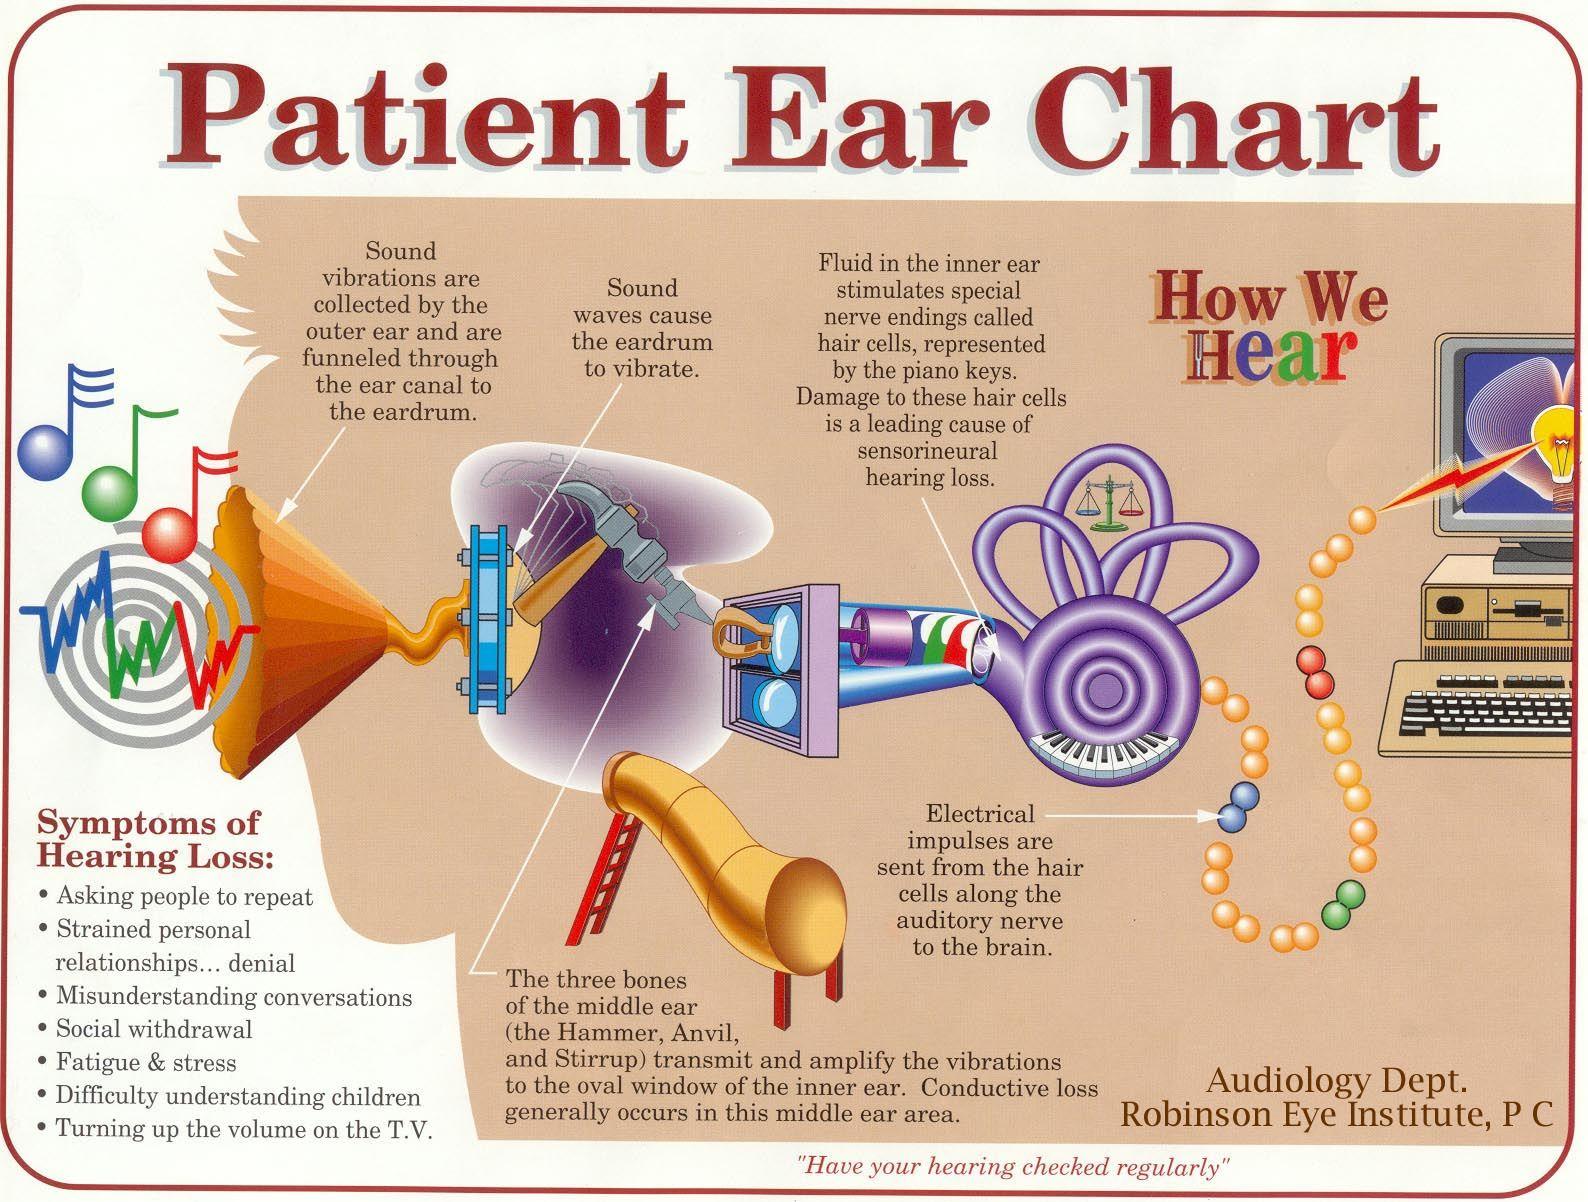 Robinson Eye Institute P C Patient Ear Chart